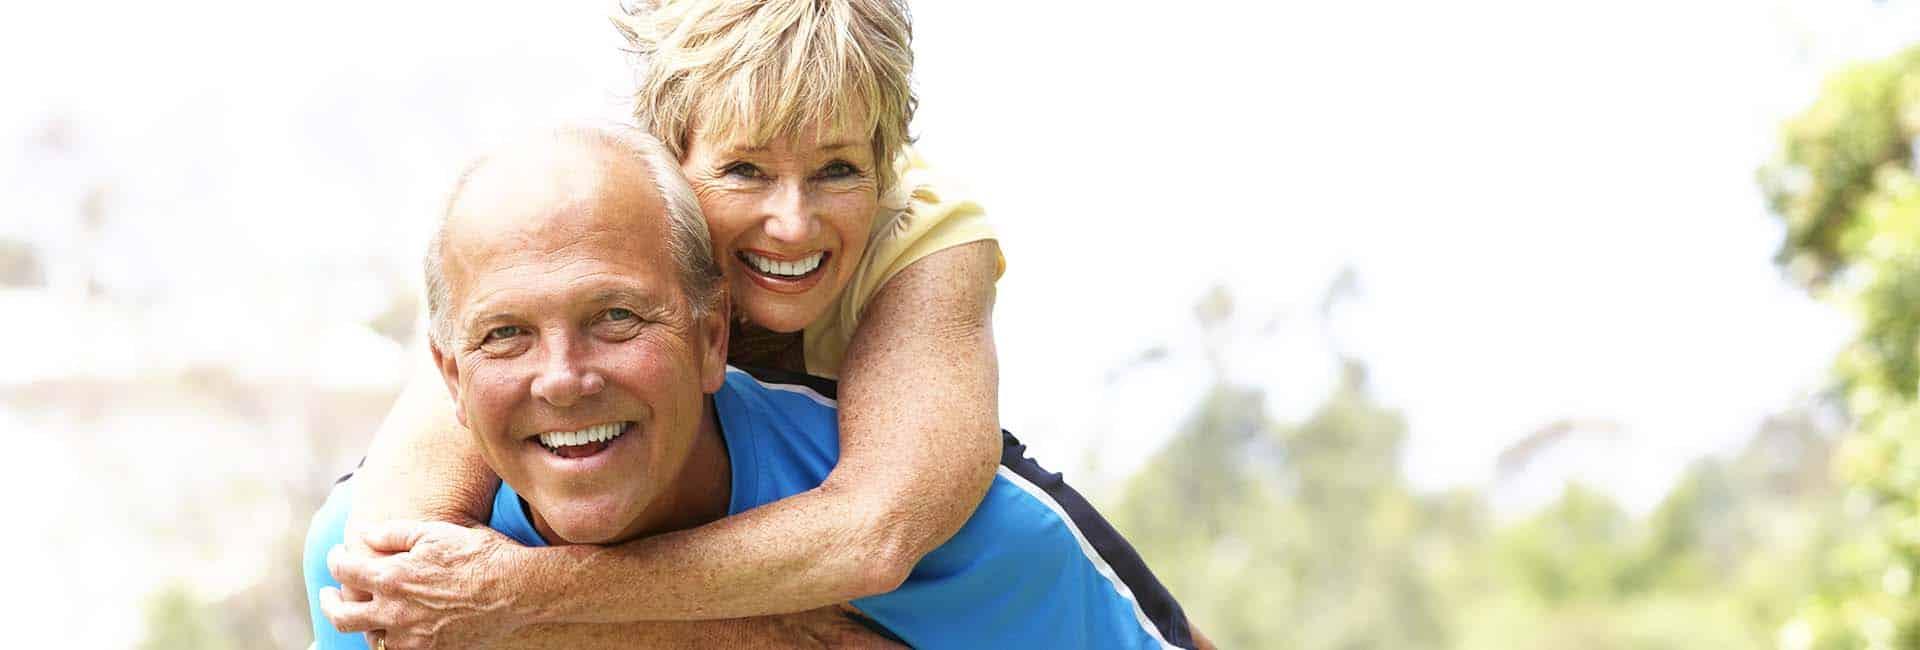 Dental Implants Hero Image